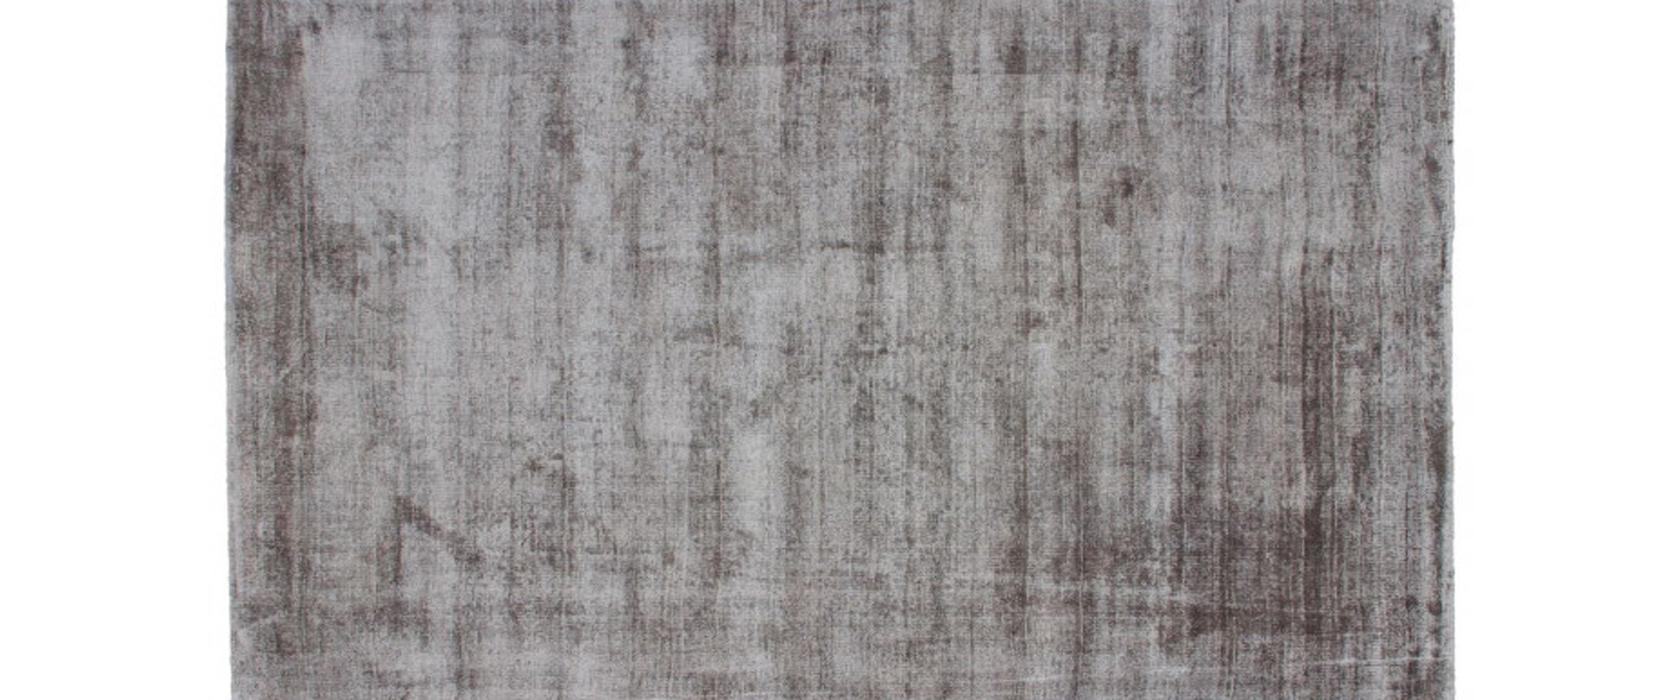 Килим My Maori 220 Silver 160х230 см - Pufetto